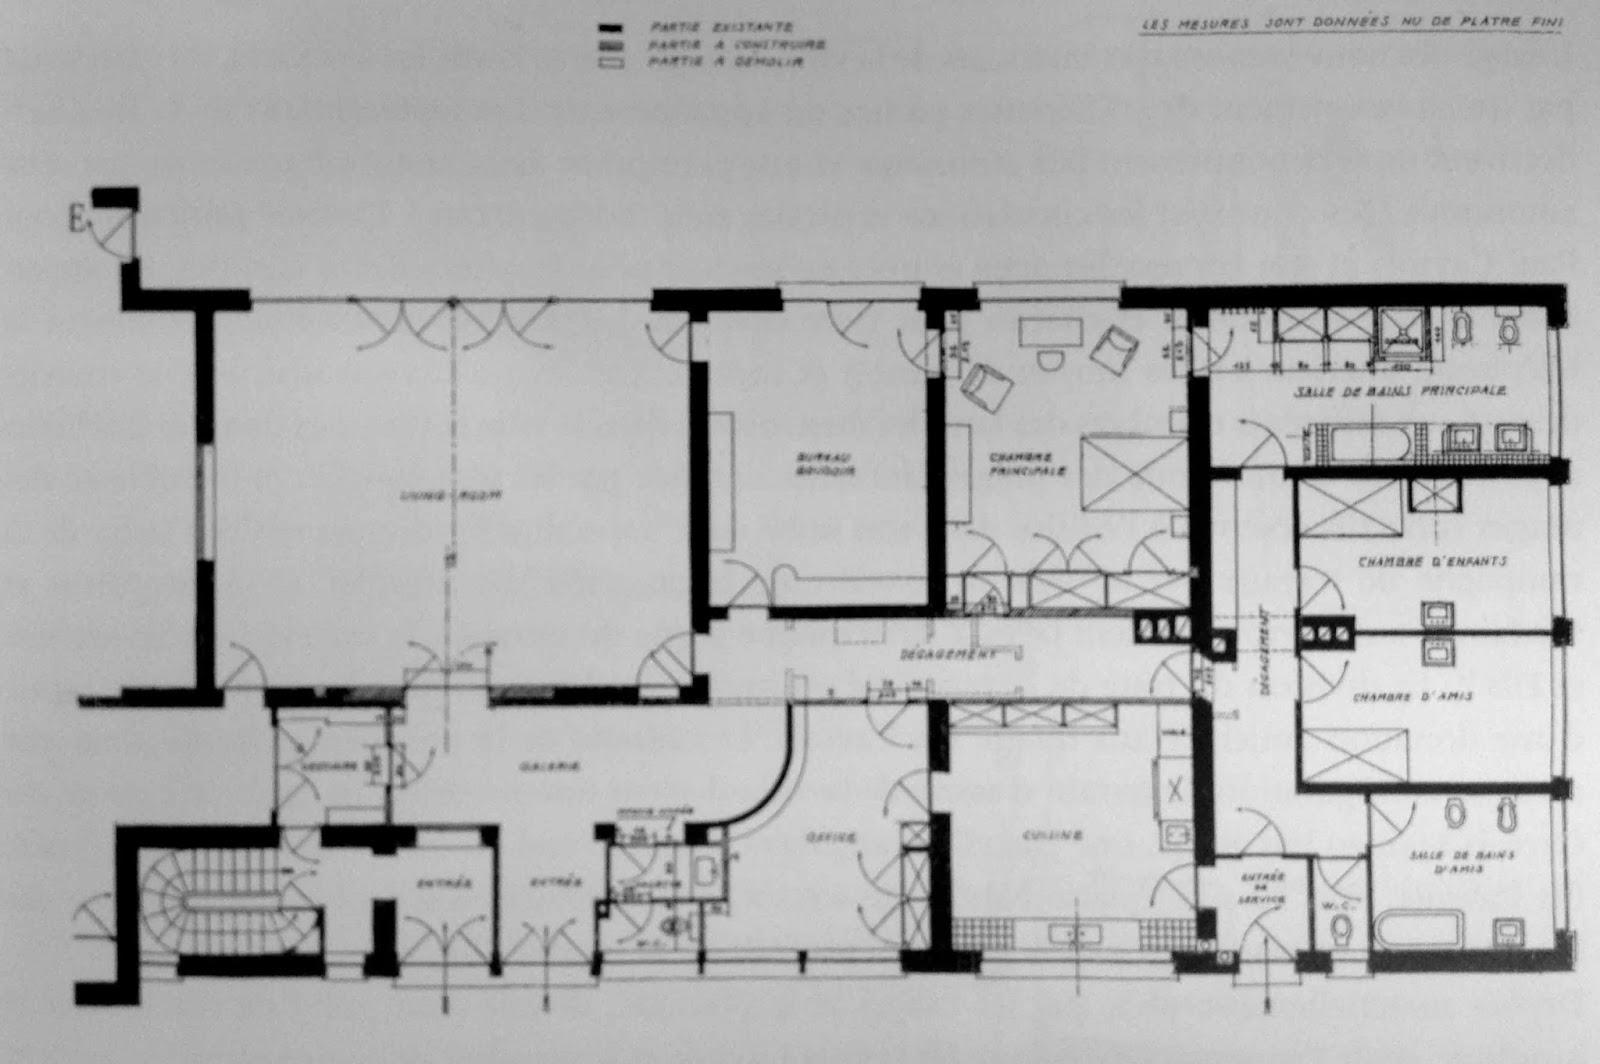 plan de maison moderne avec etage. Black Bedroom Furniture Sets. Home Design Ideas